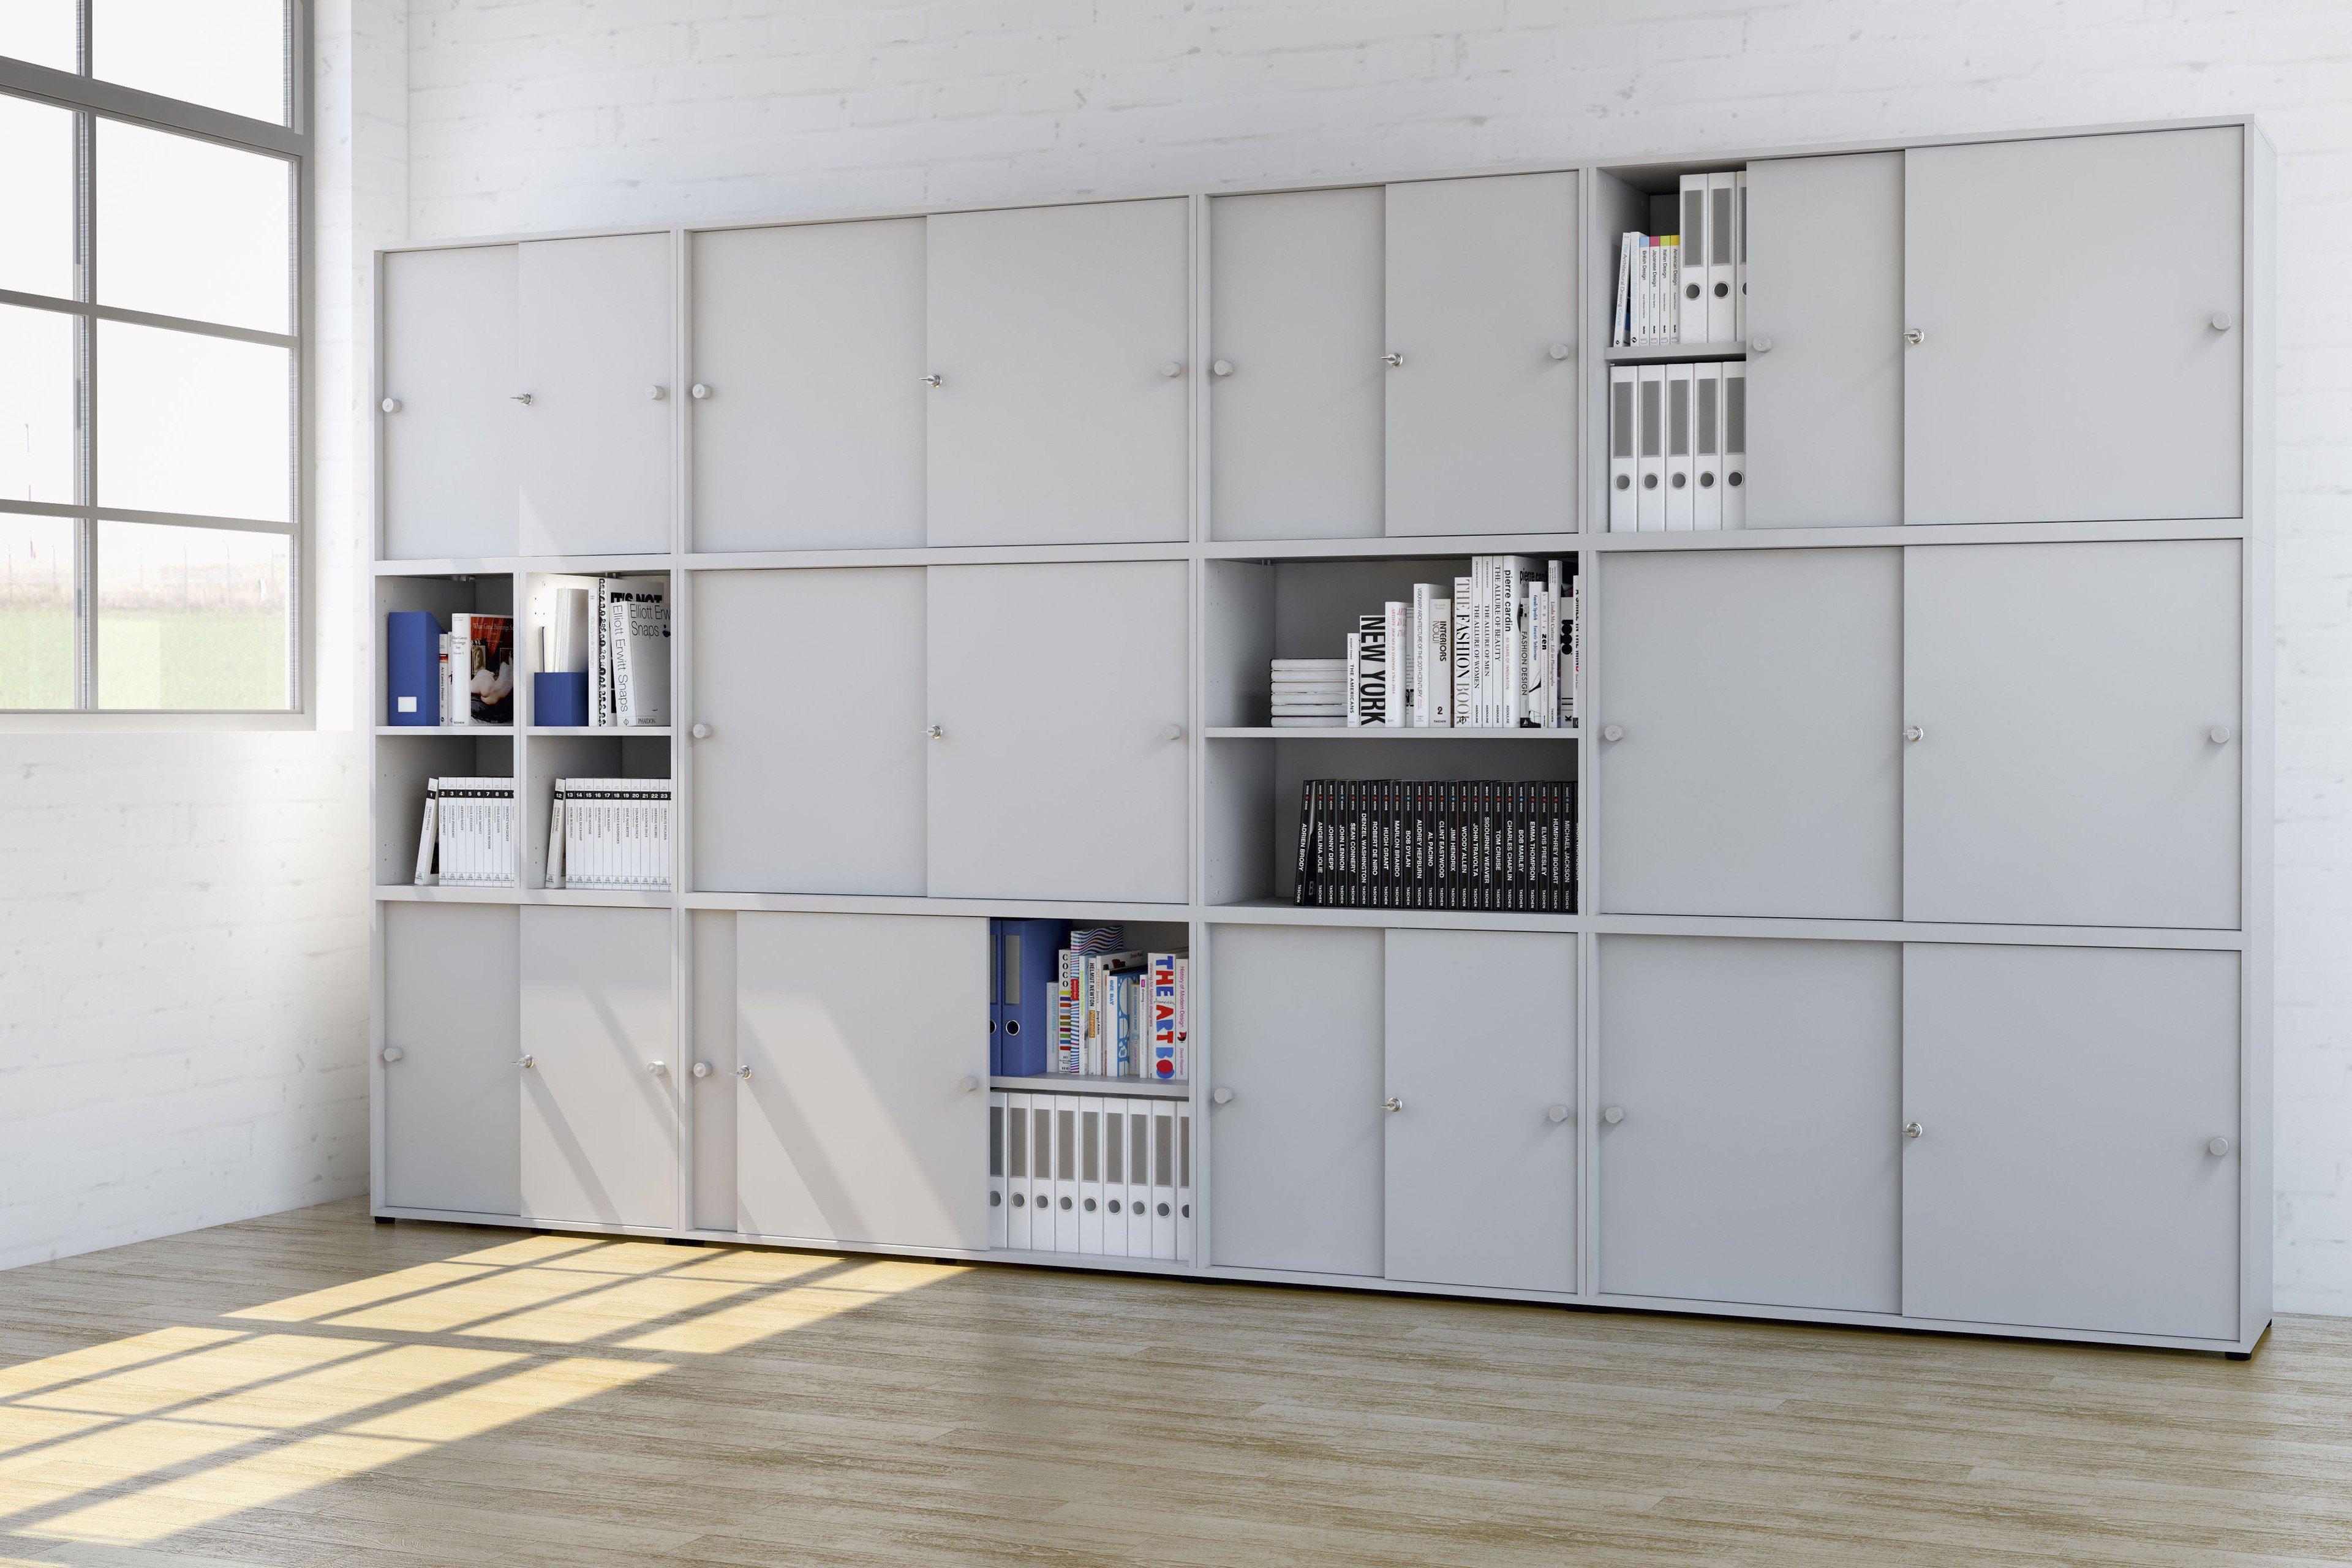 welle aktenschrank system kyro office grau m bel letz ihr online shop. Black Bedroom Furniture Sets. Home Design Ideas